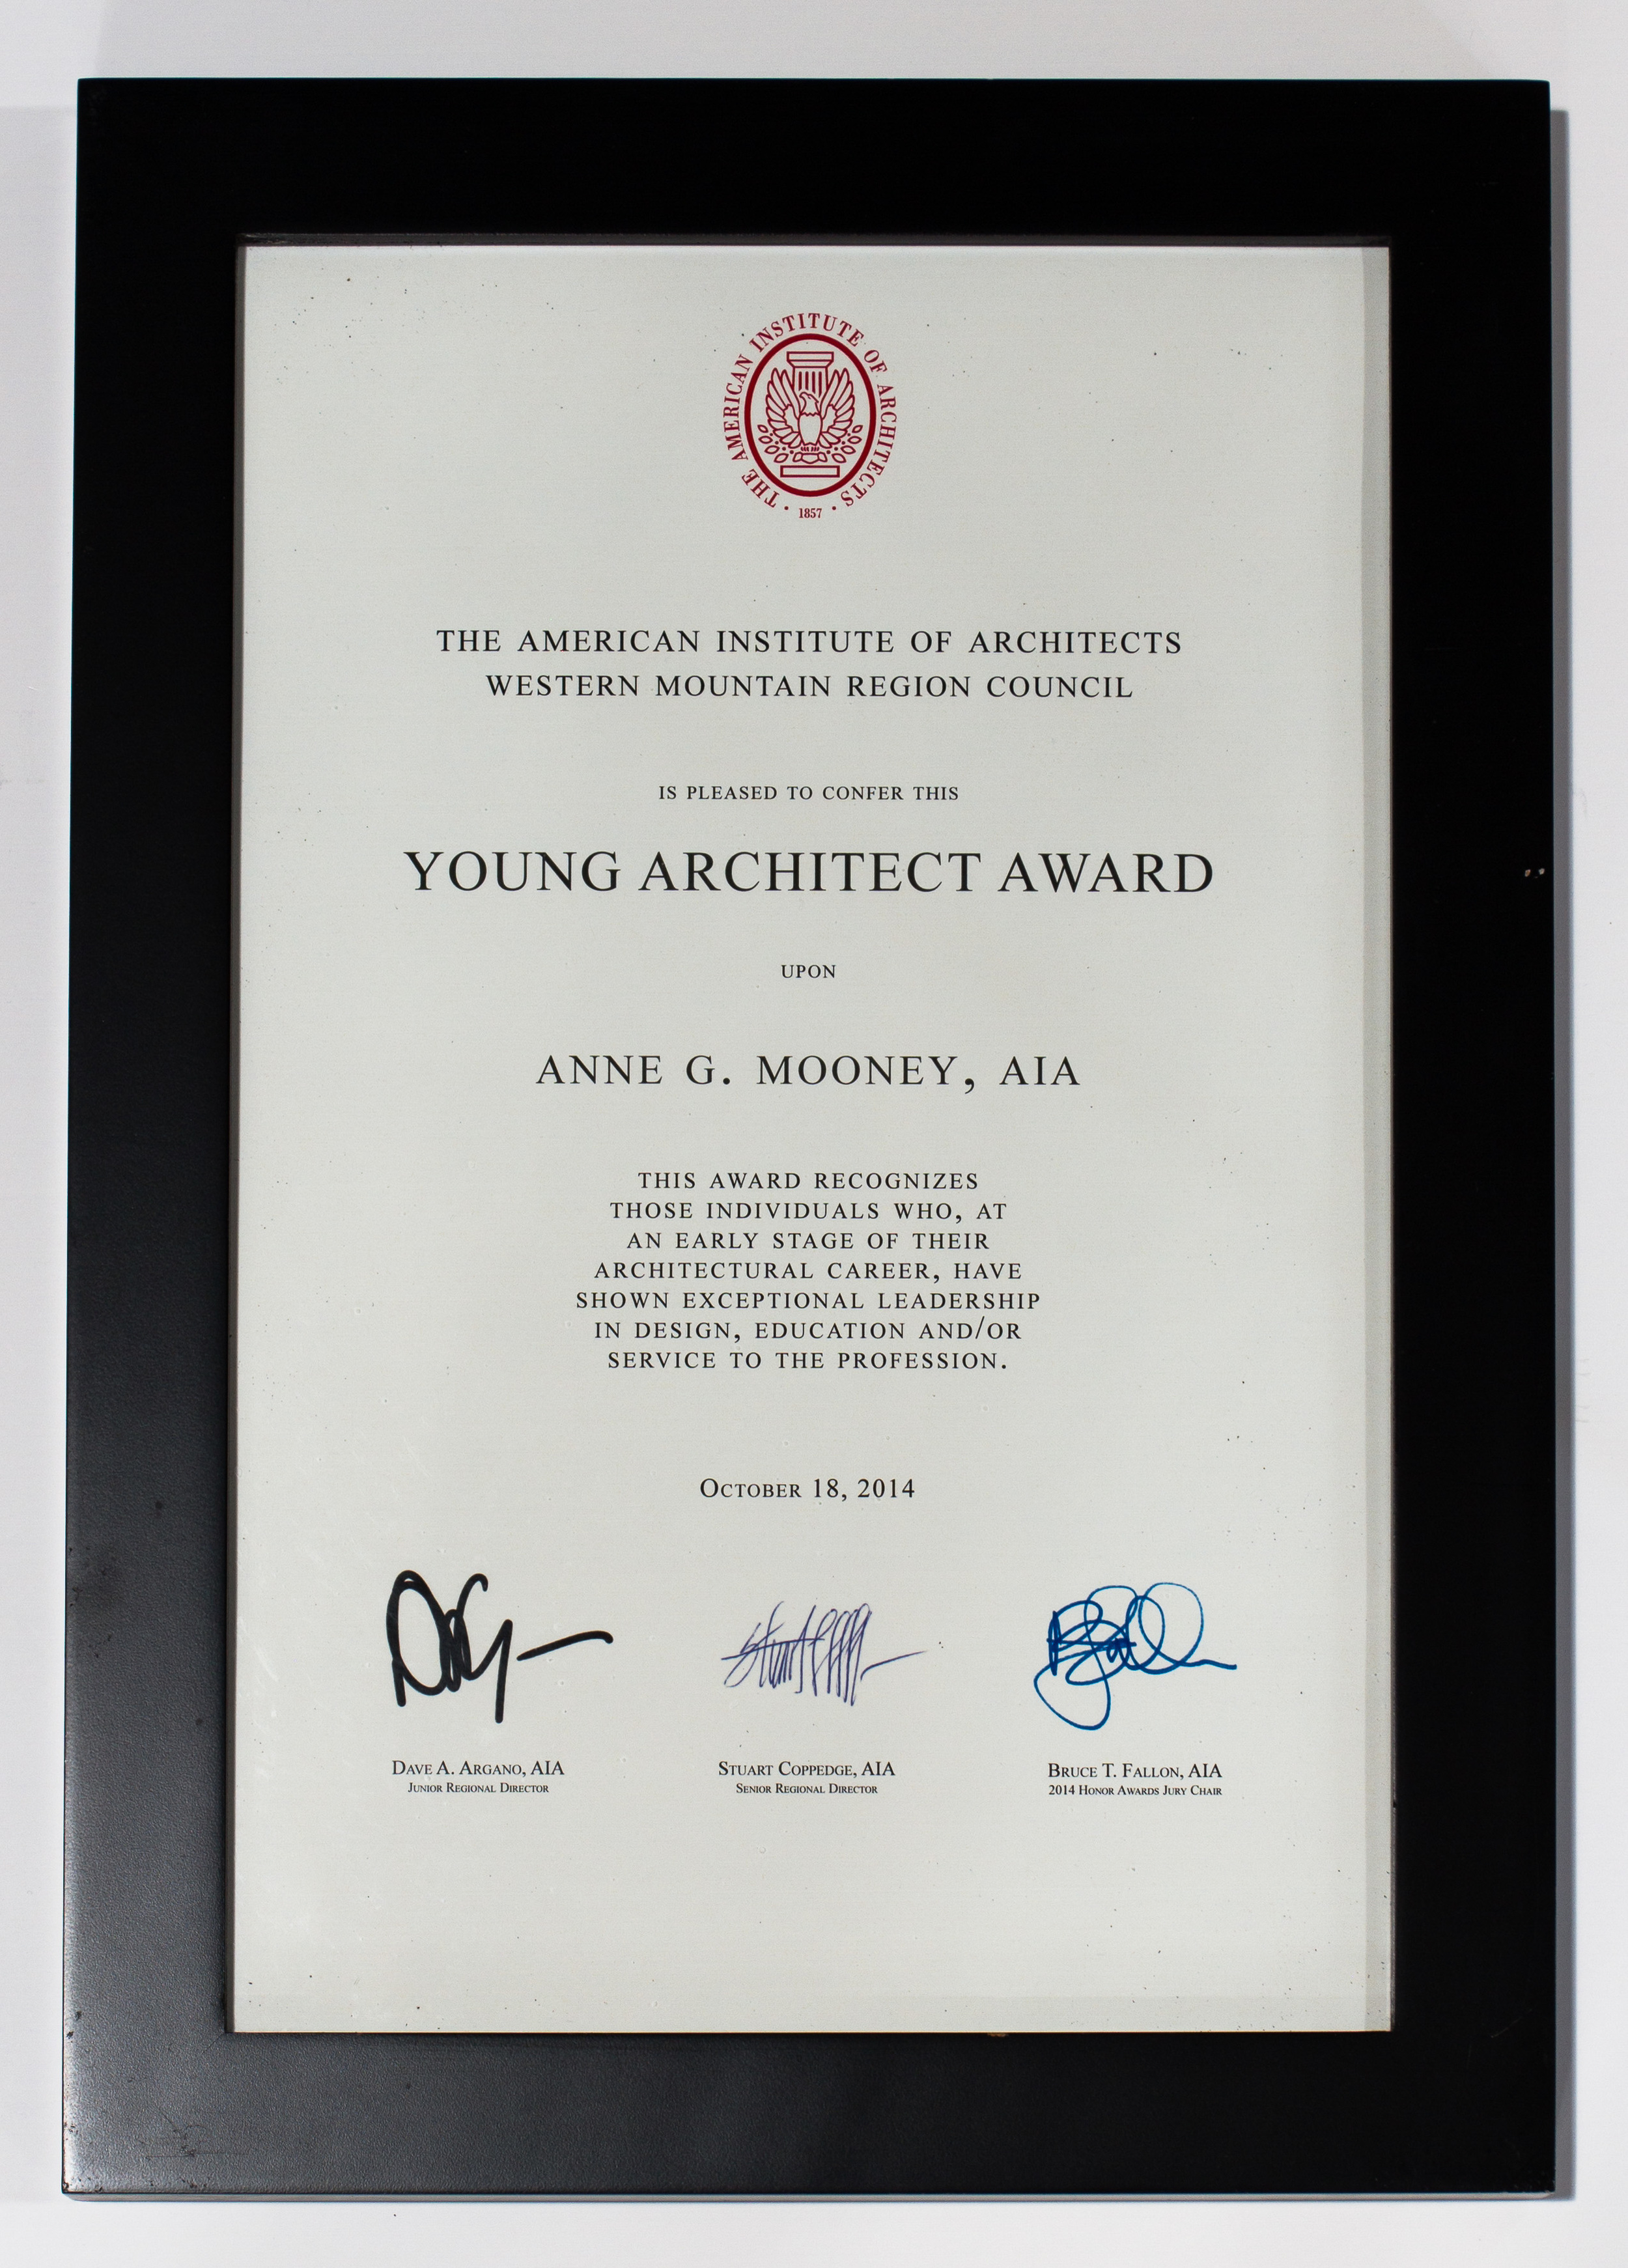 SparanoMooneyArchitecture_Award(12)